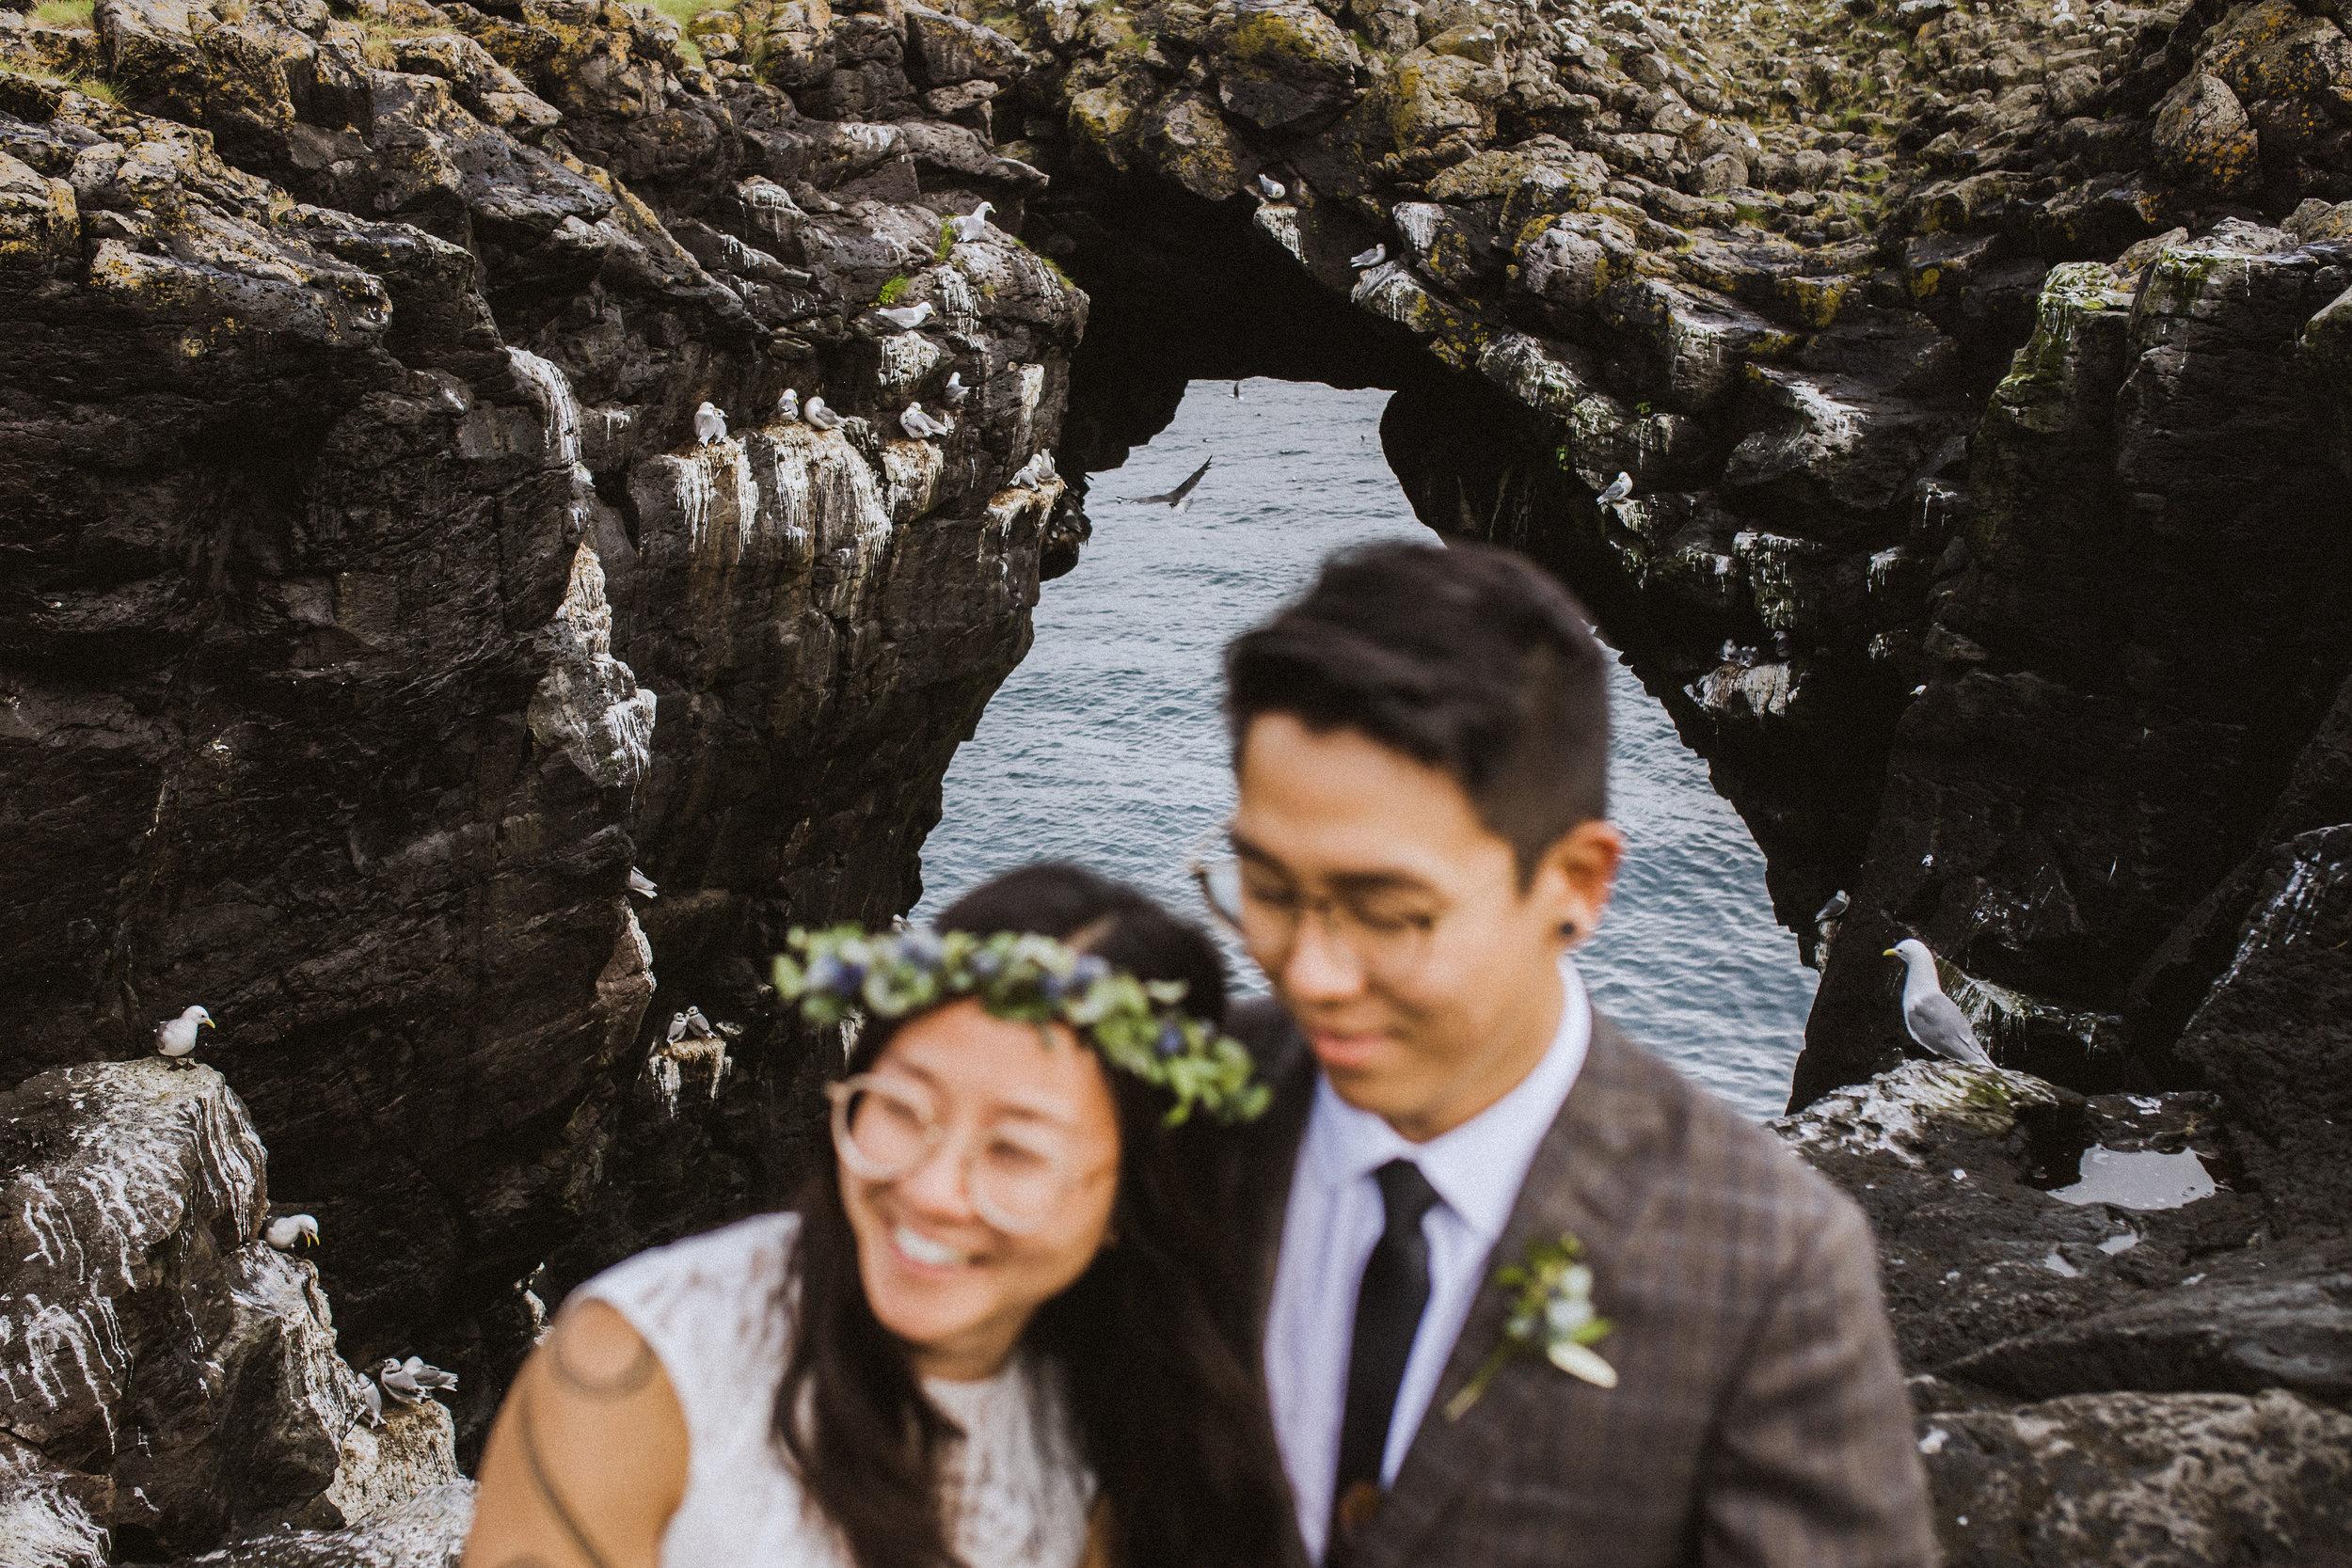 Best-wedding-photographer-in-iceland-kristin-maria112.jpg